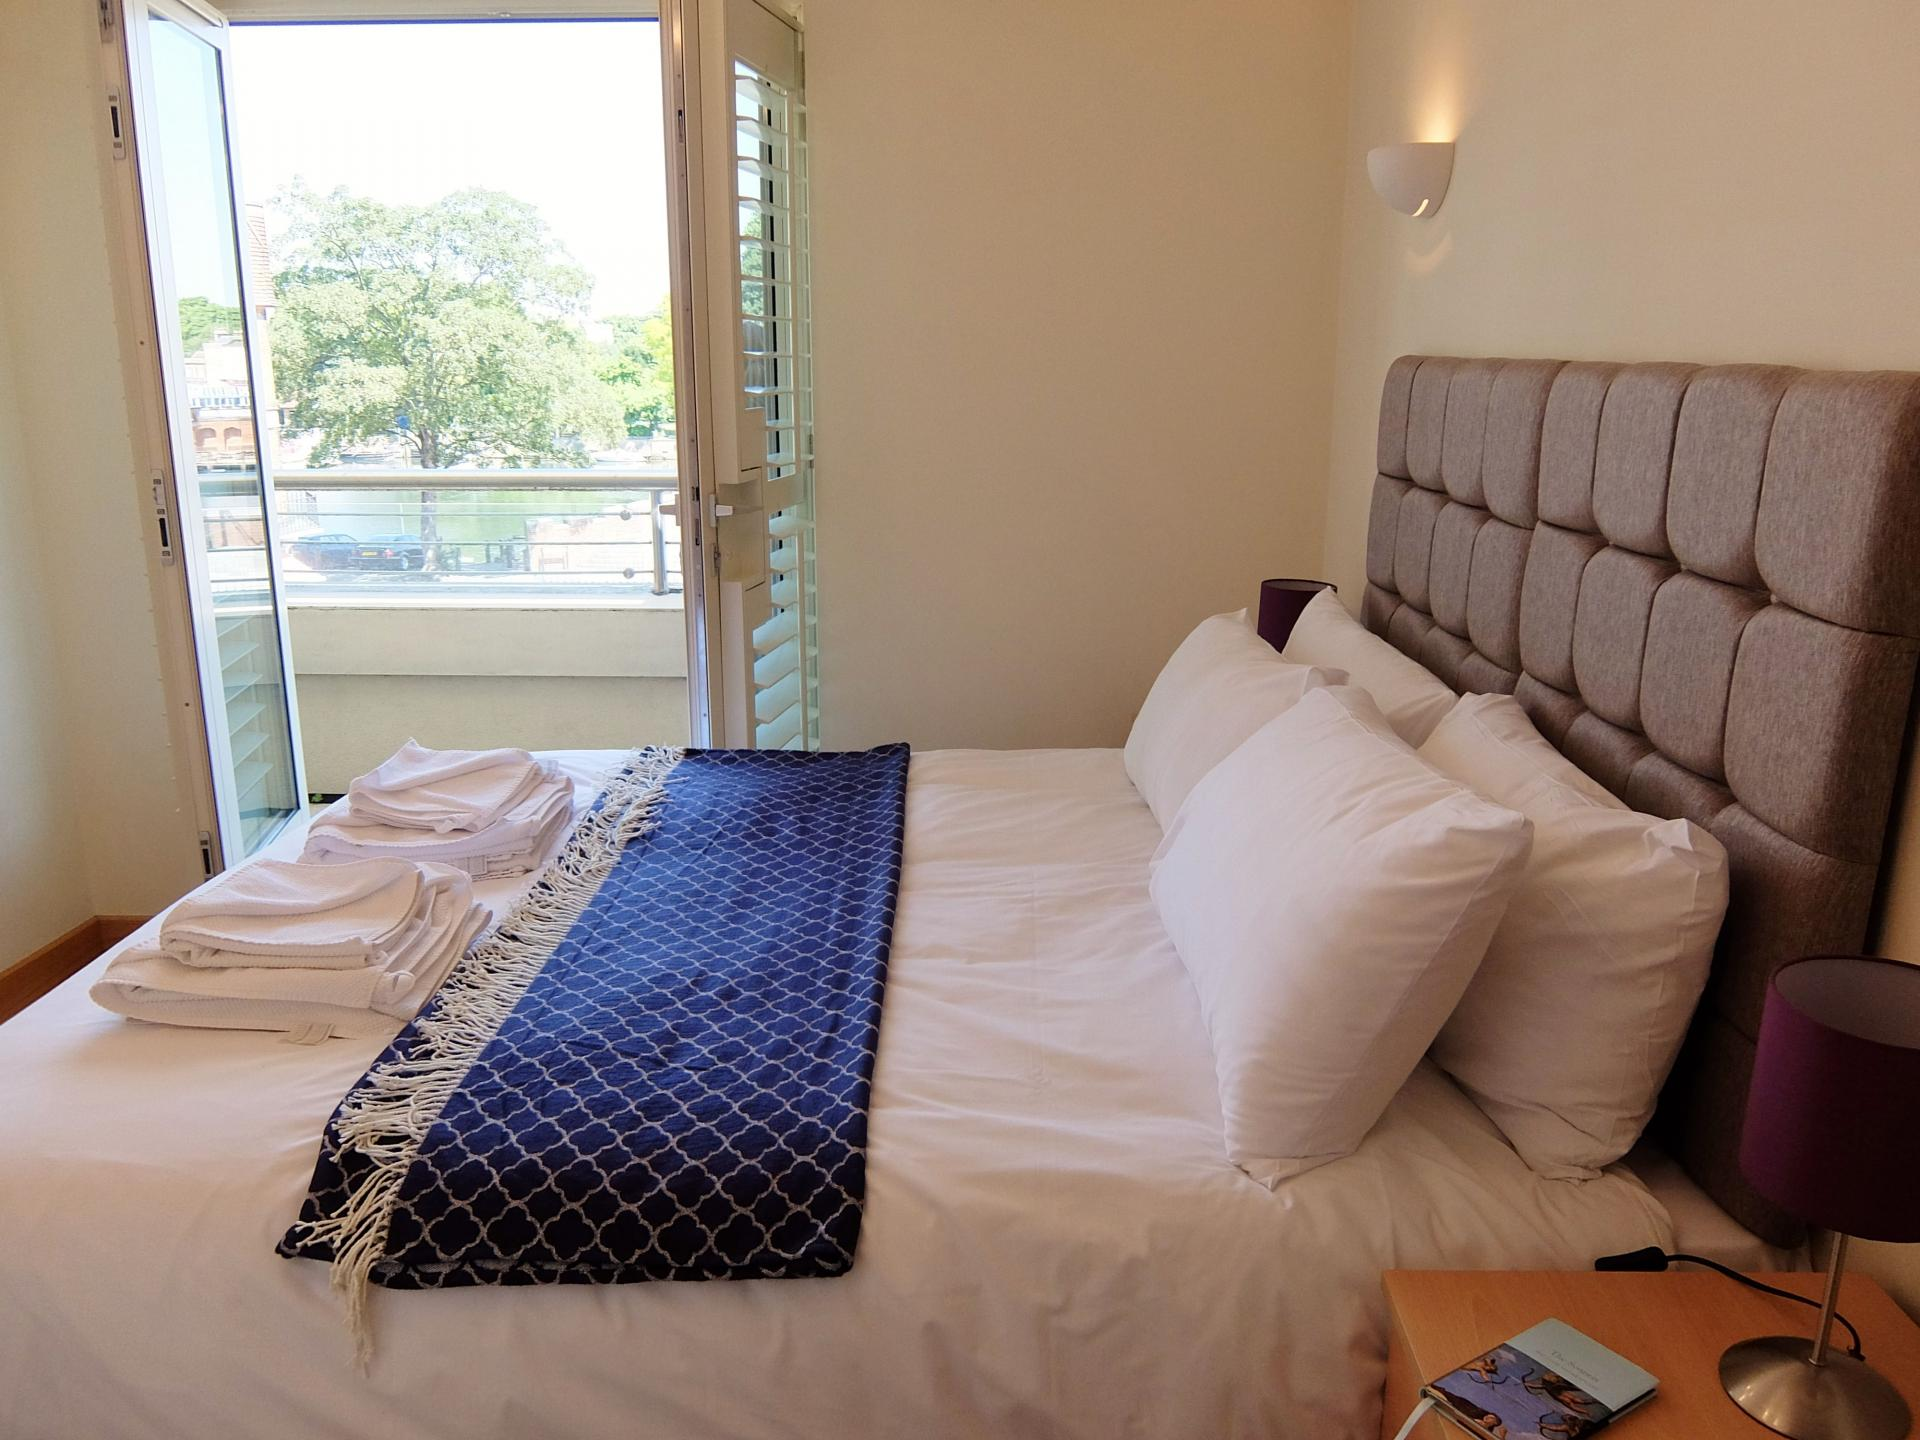 Bedroom Hampton Court Creek Road Apartments - Citybase Apartments